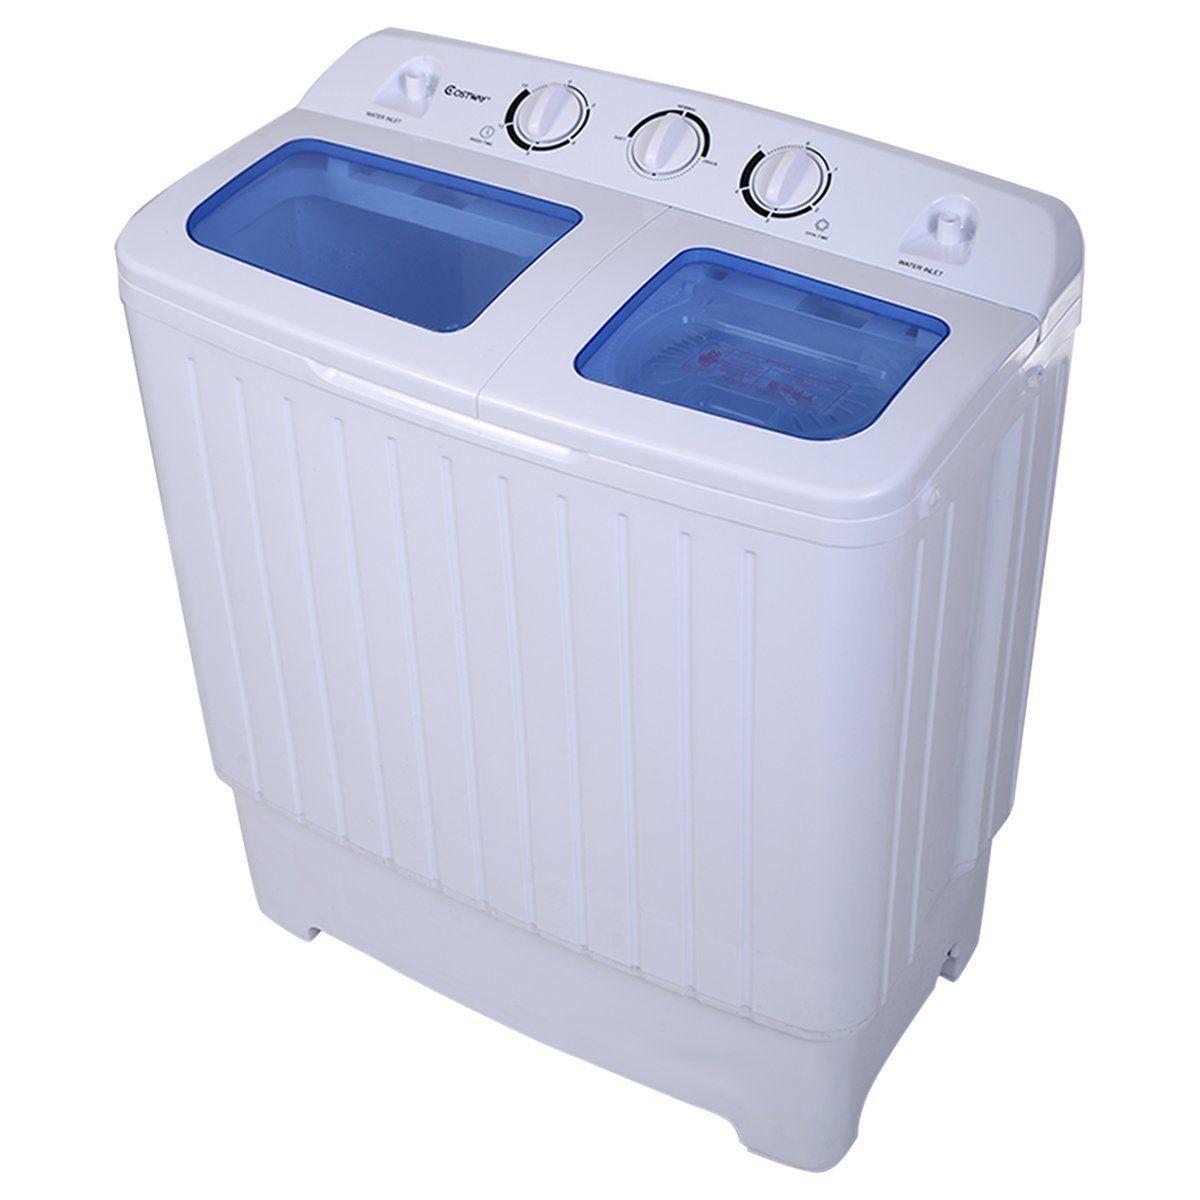 Giantex Portable Mini Compact Twin Tub 11lb Washing Machine Washer ...